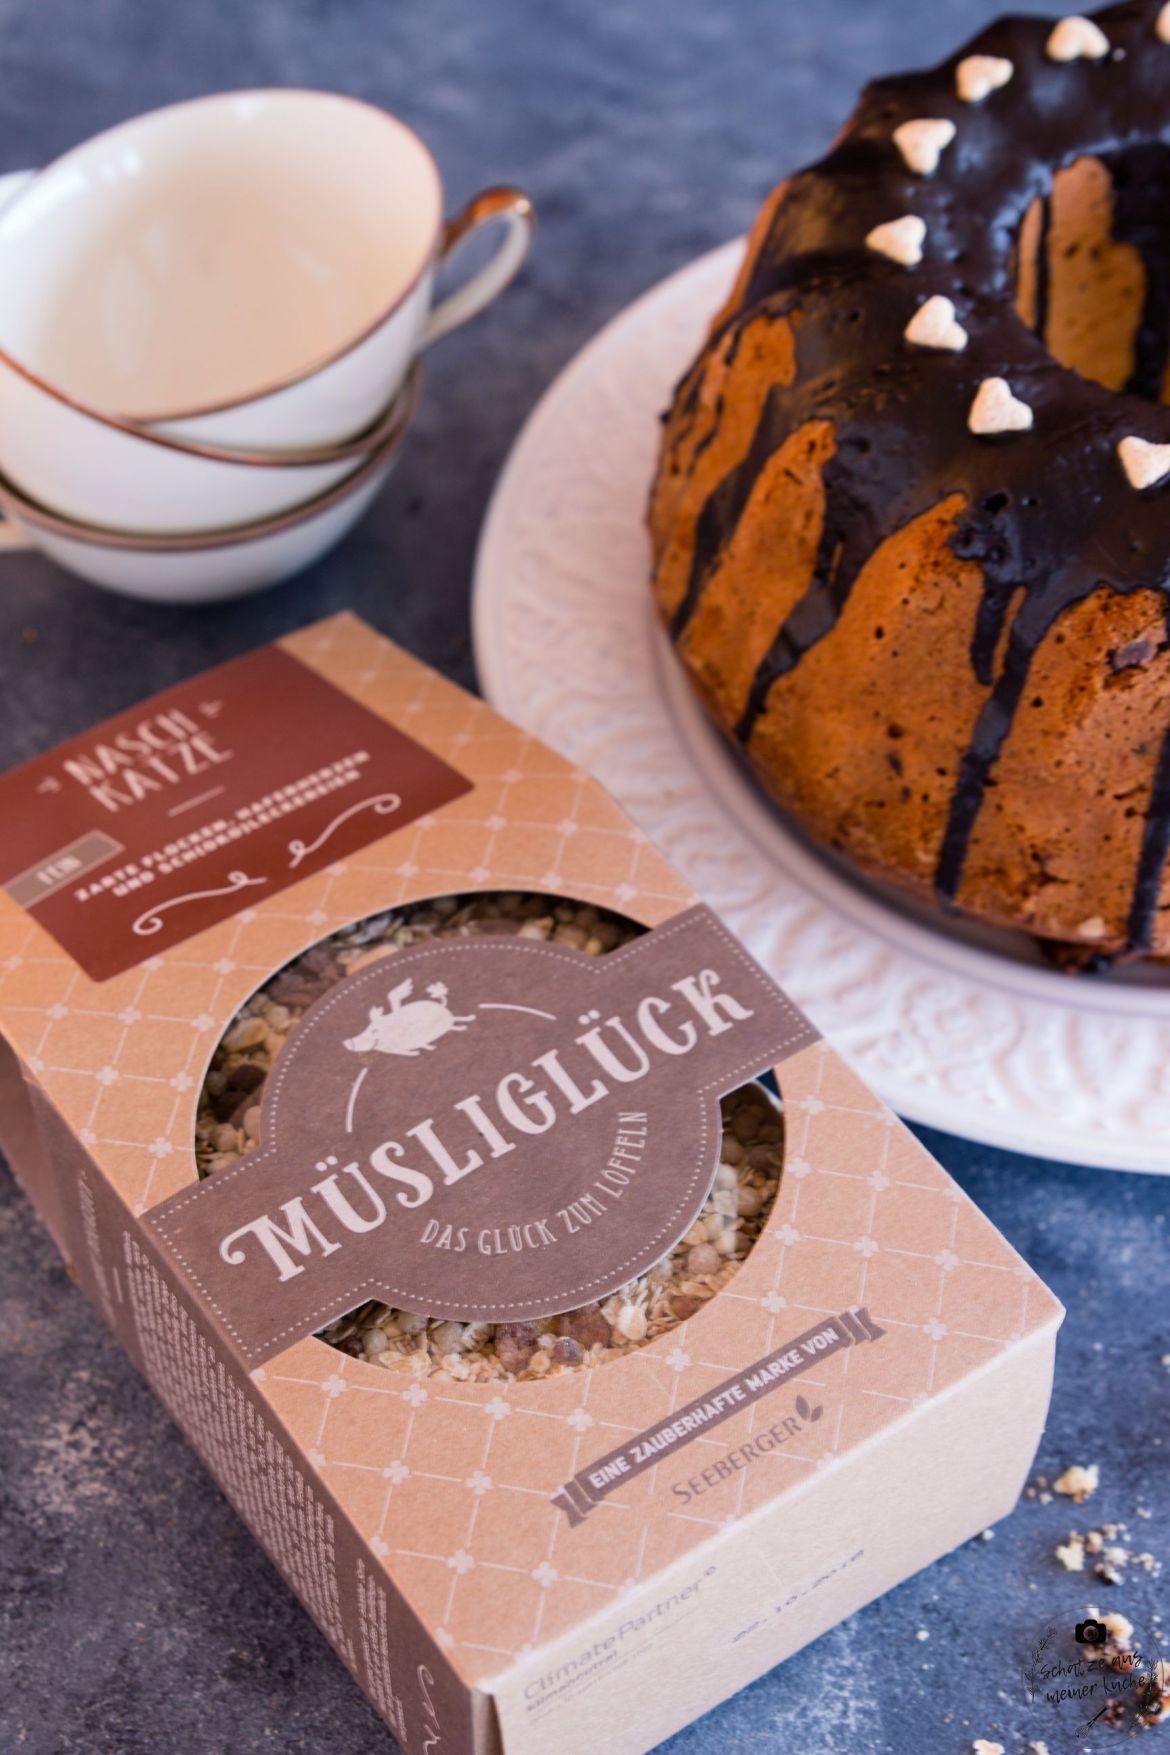 Naschkatze Fluffiger Knuspermüsli-Gugelhupf mit Schokolade Müsliglück